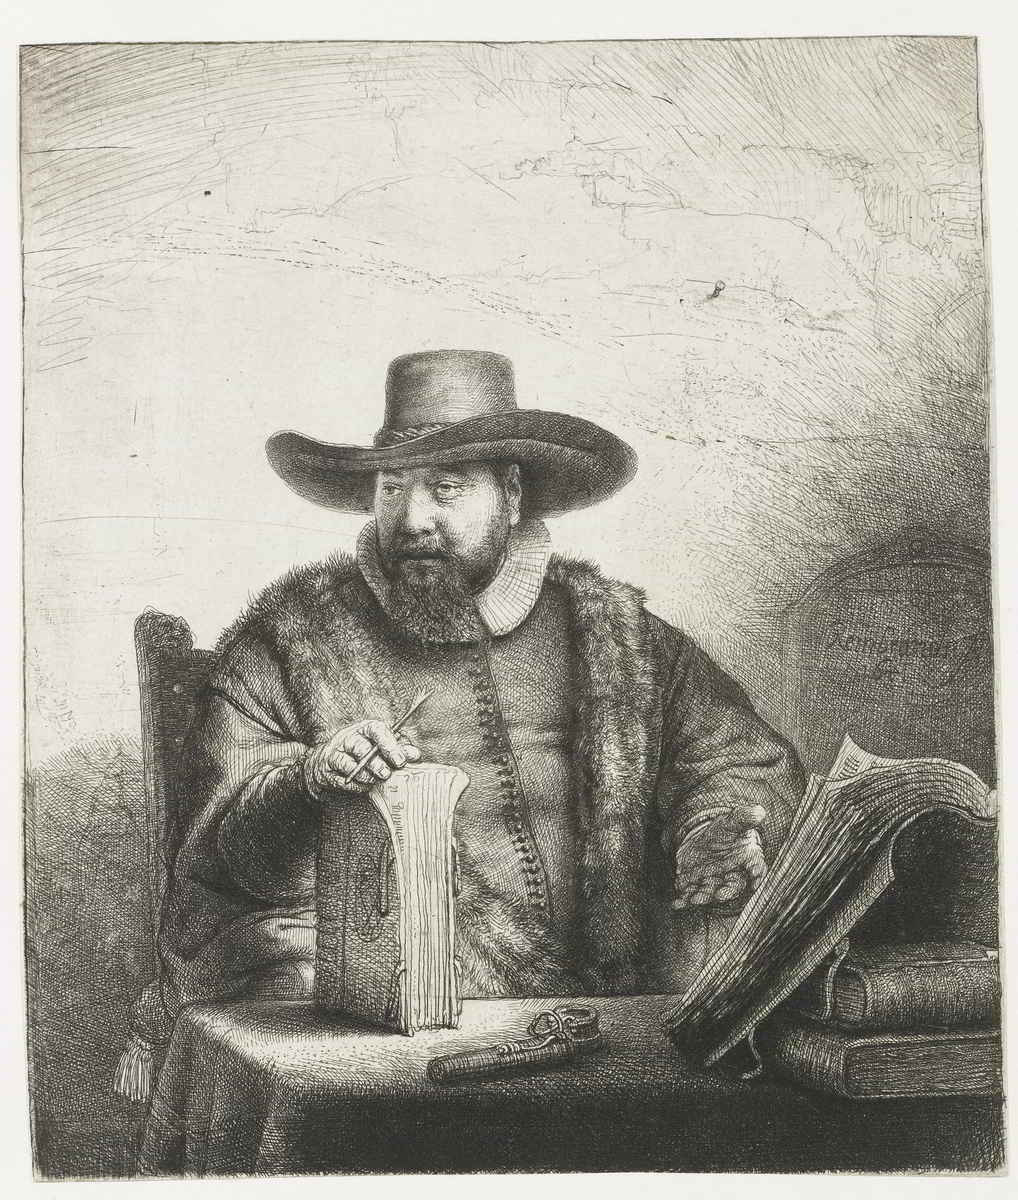 Rembrandt van Rijn (1606-1669), <em>The Preacher Cornelis Claesz. Anslo,</em> 1641 Rijksmuseum, Amsterdam